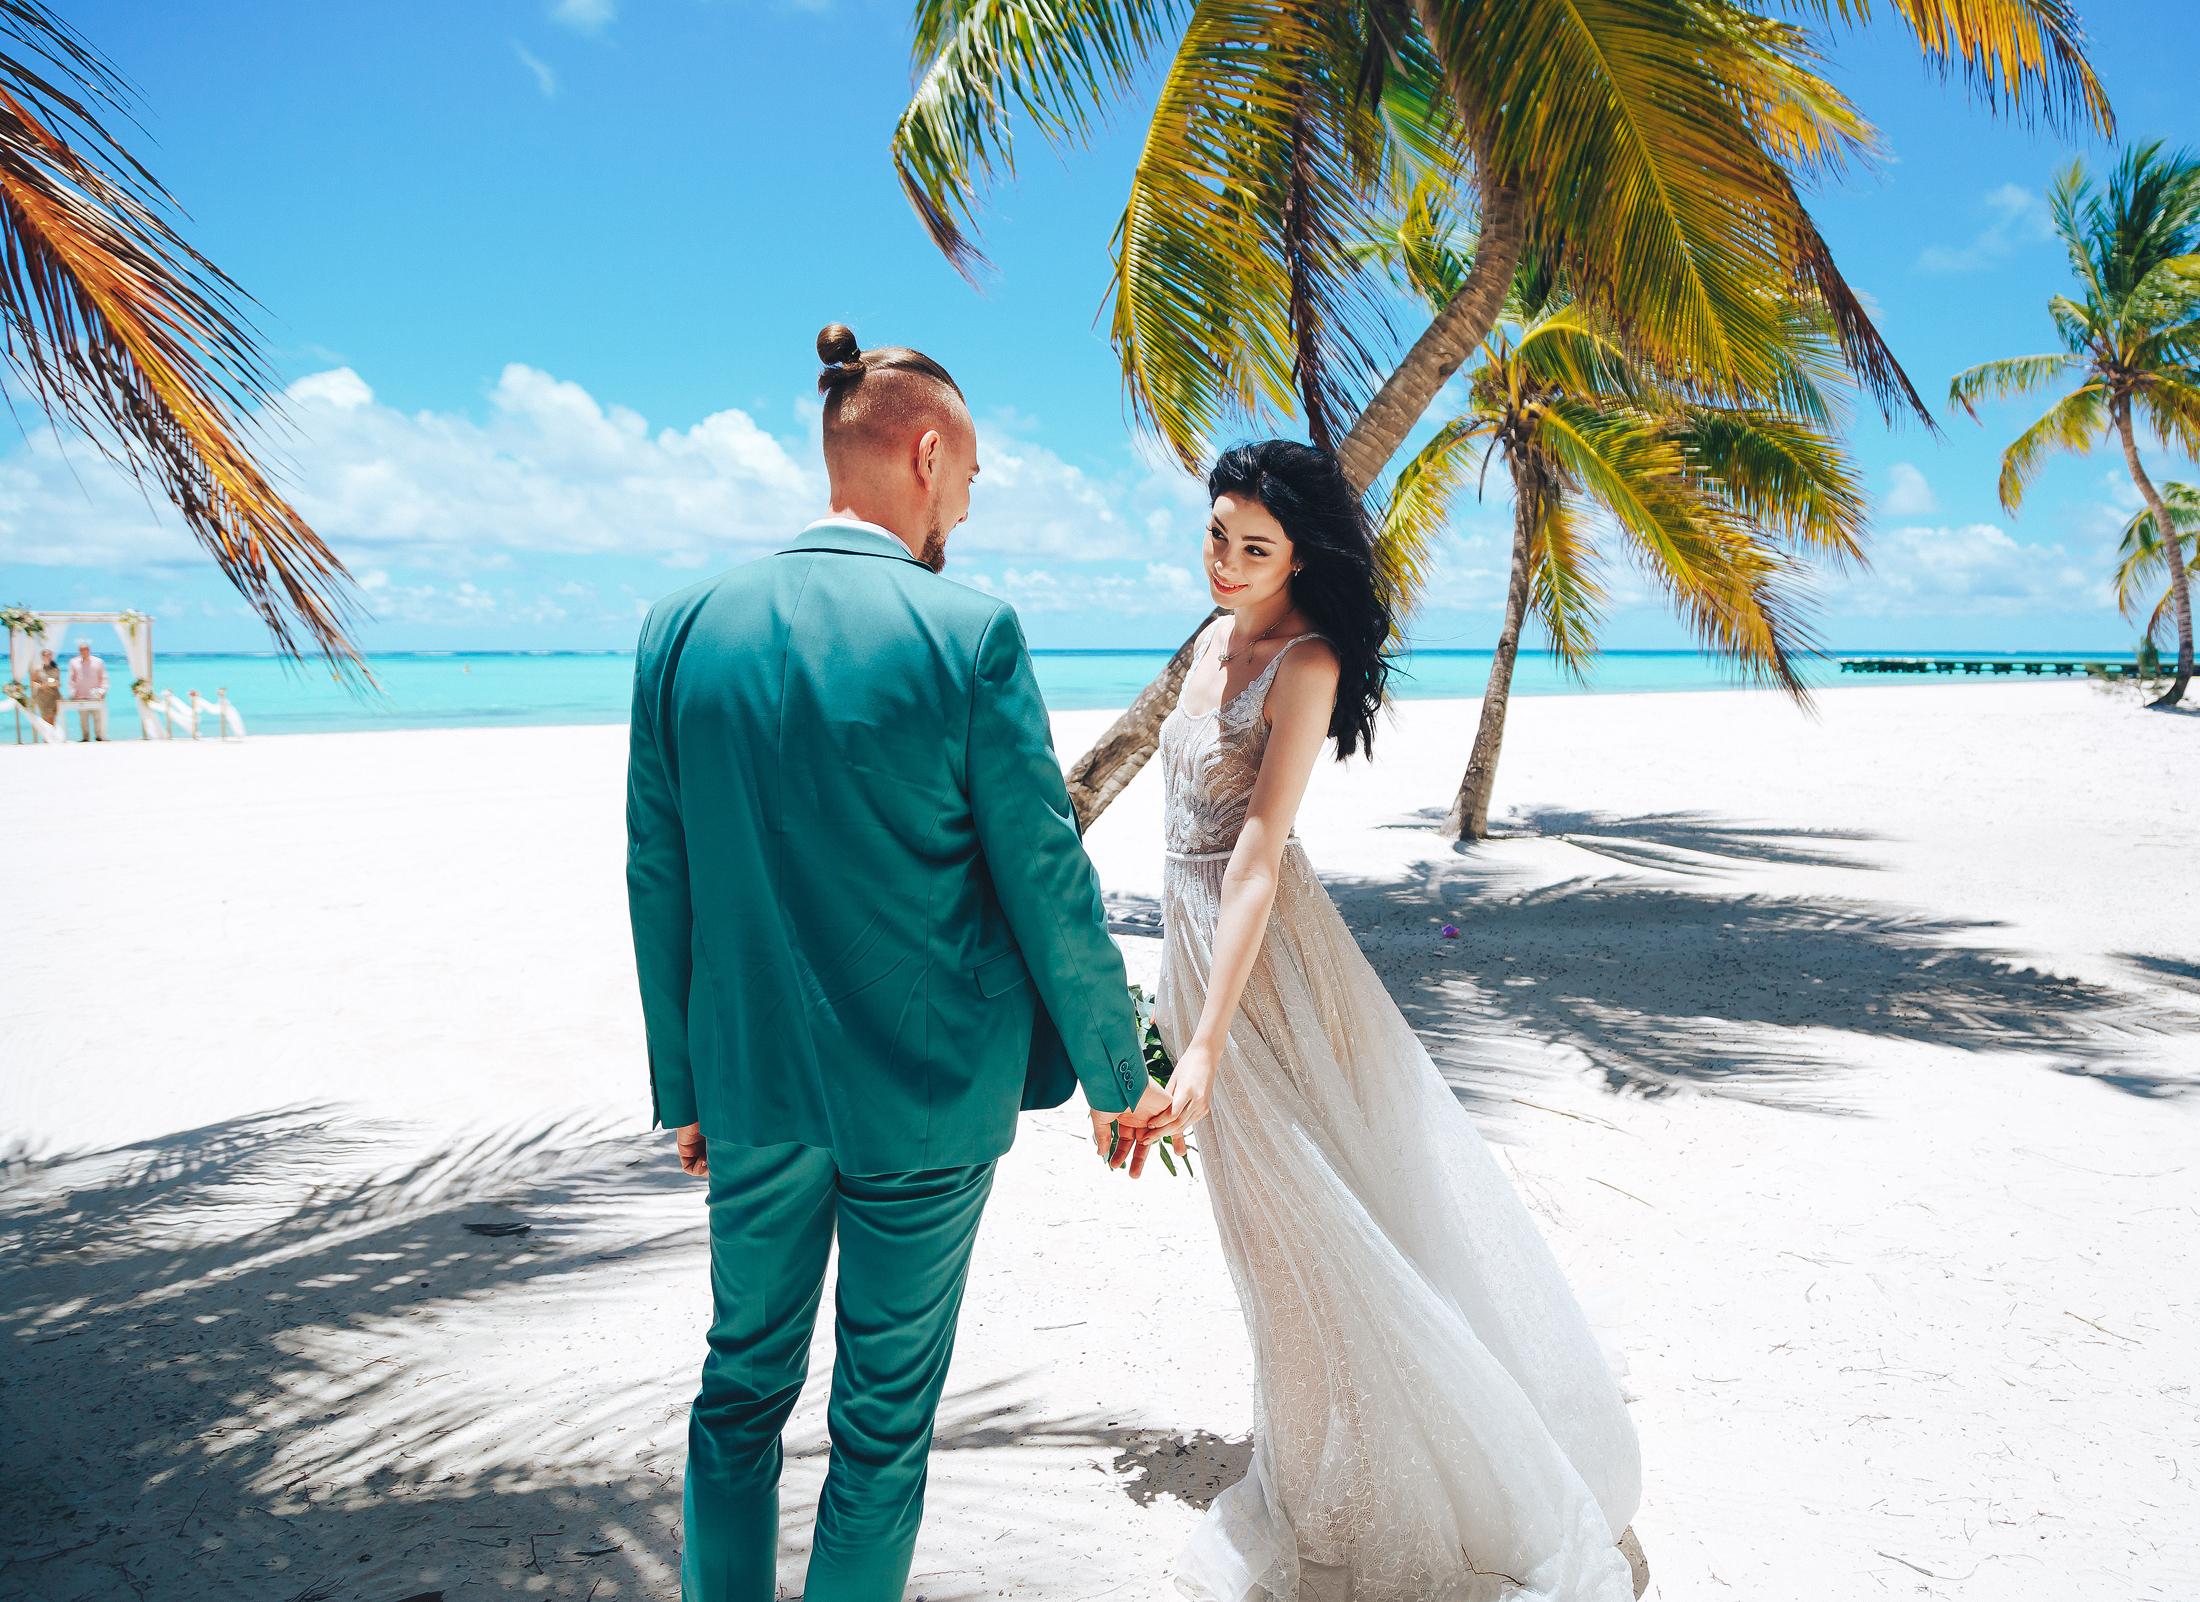 dominican-wedding-05